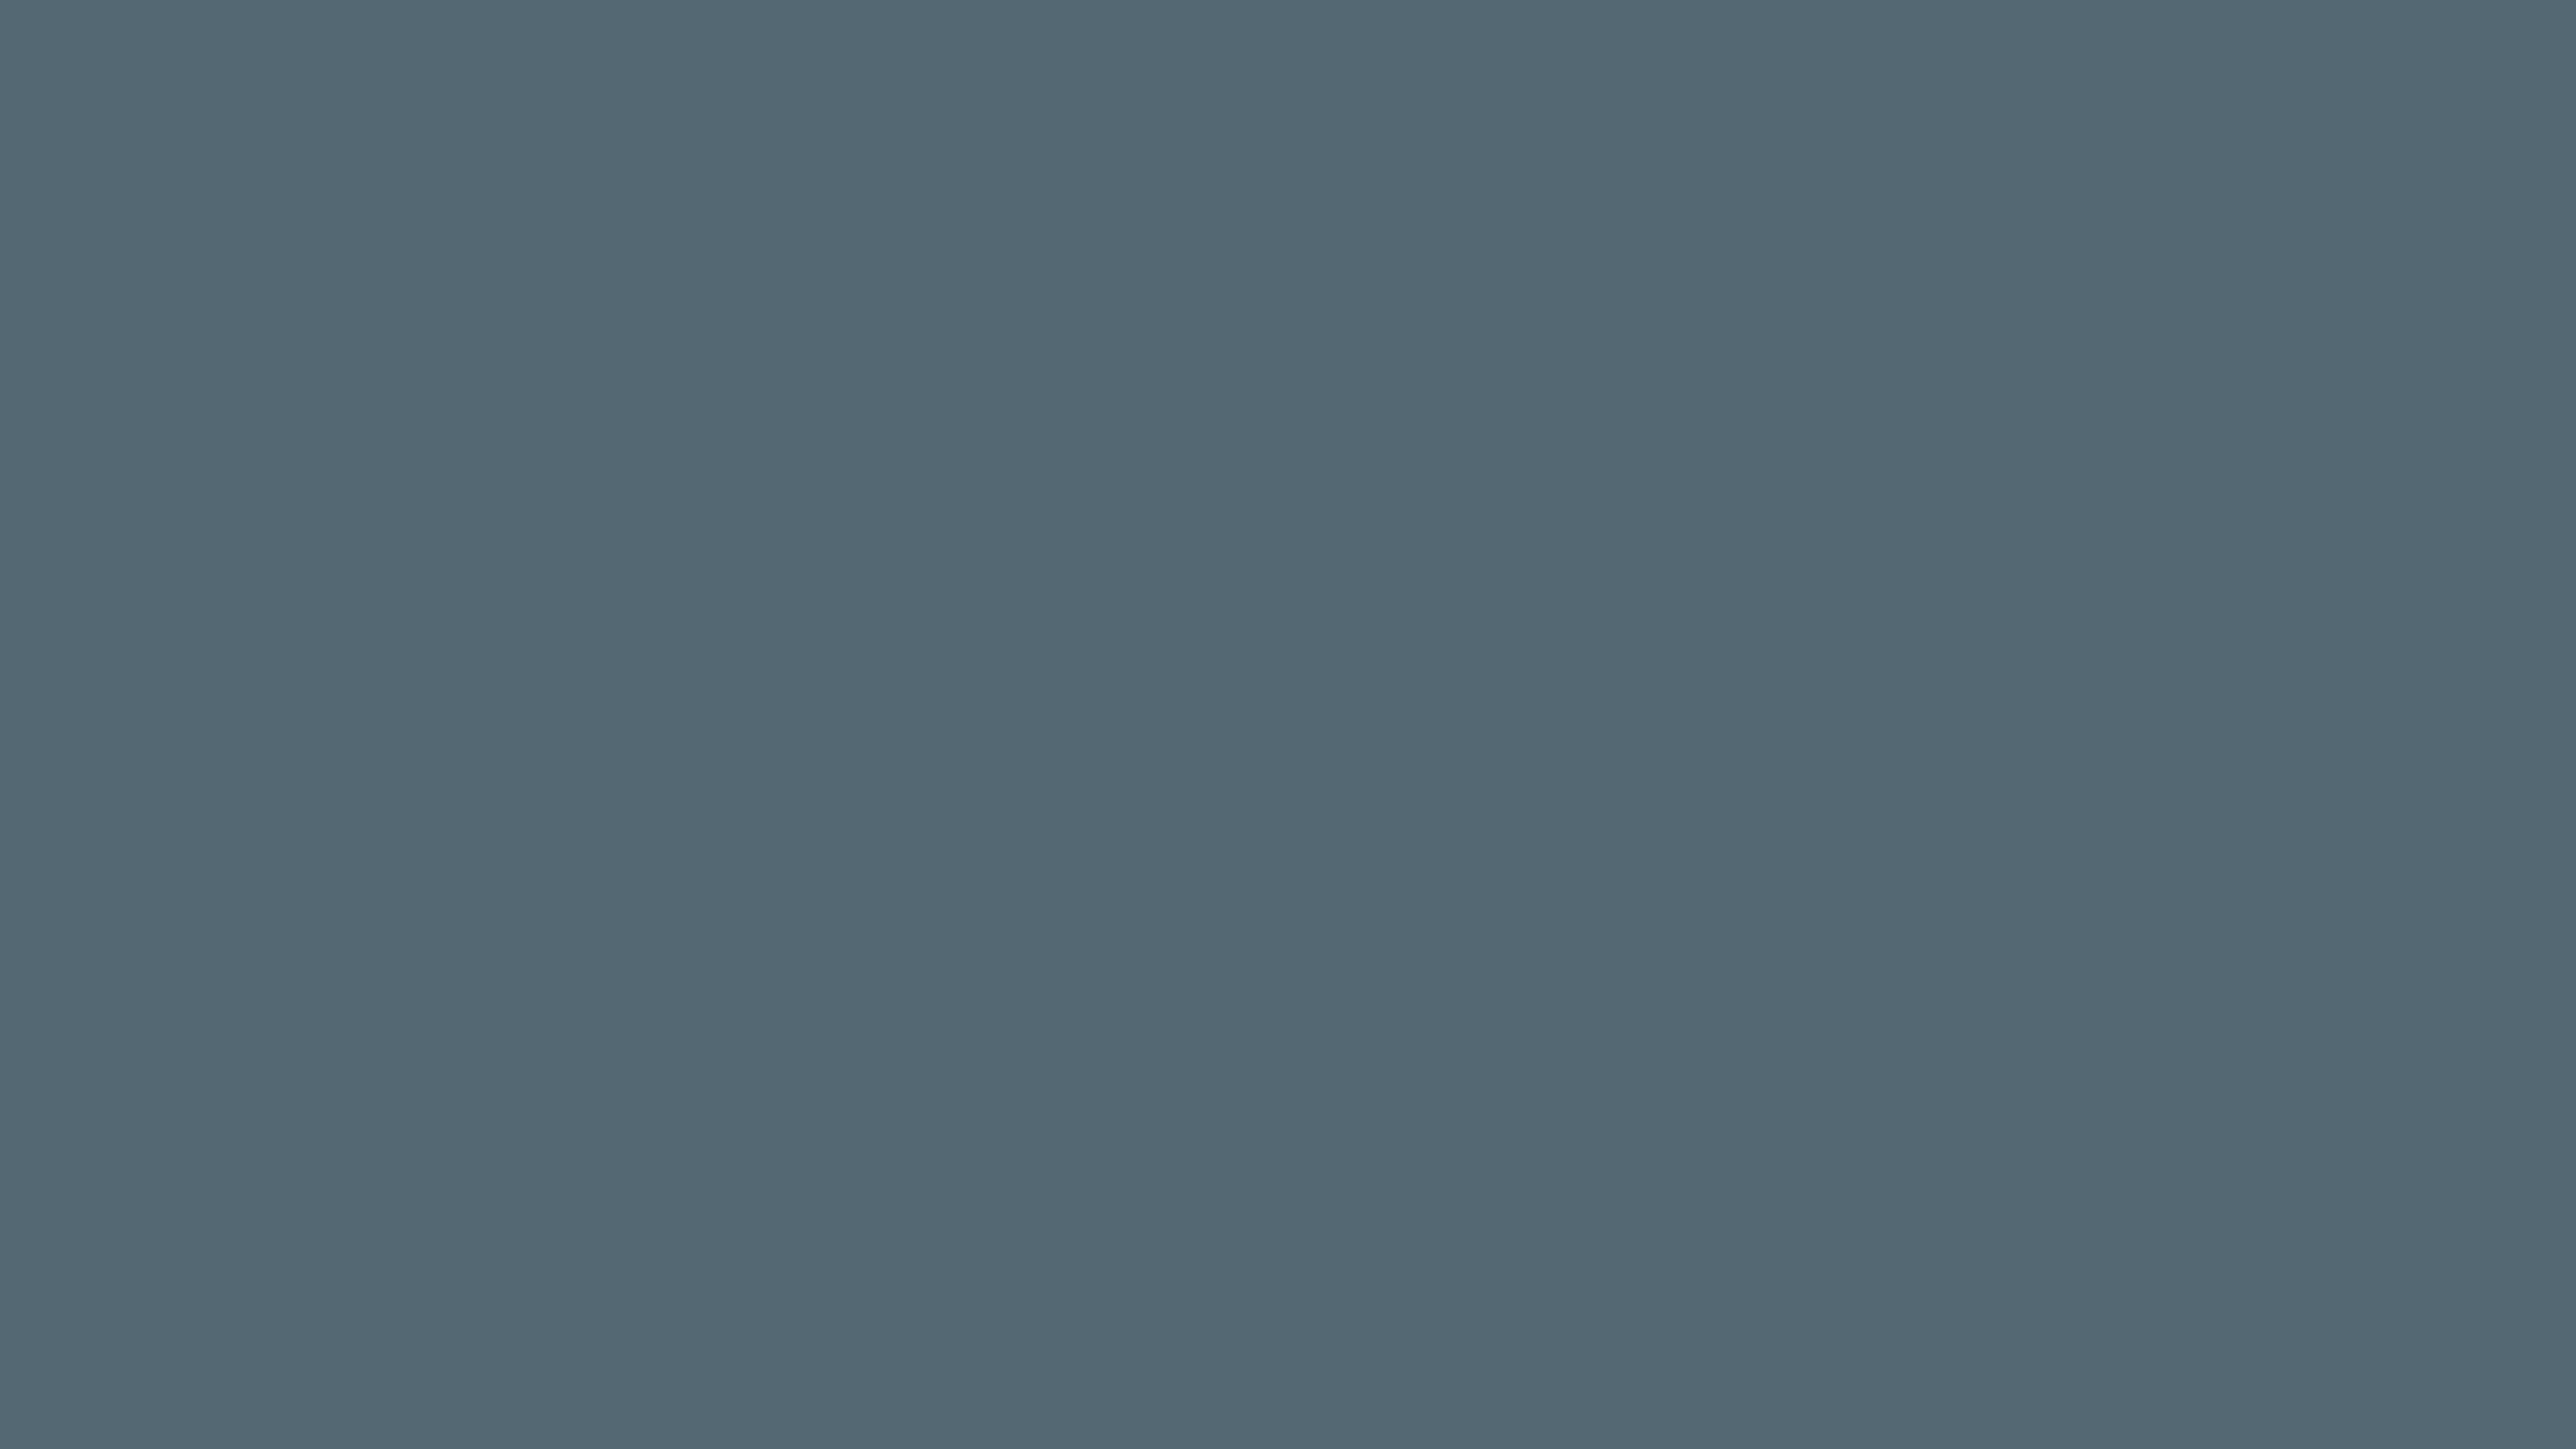 5120x2880 Cadet Solid Color Background